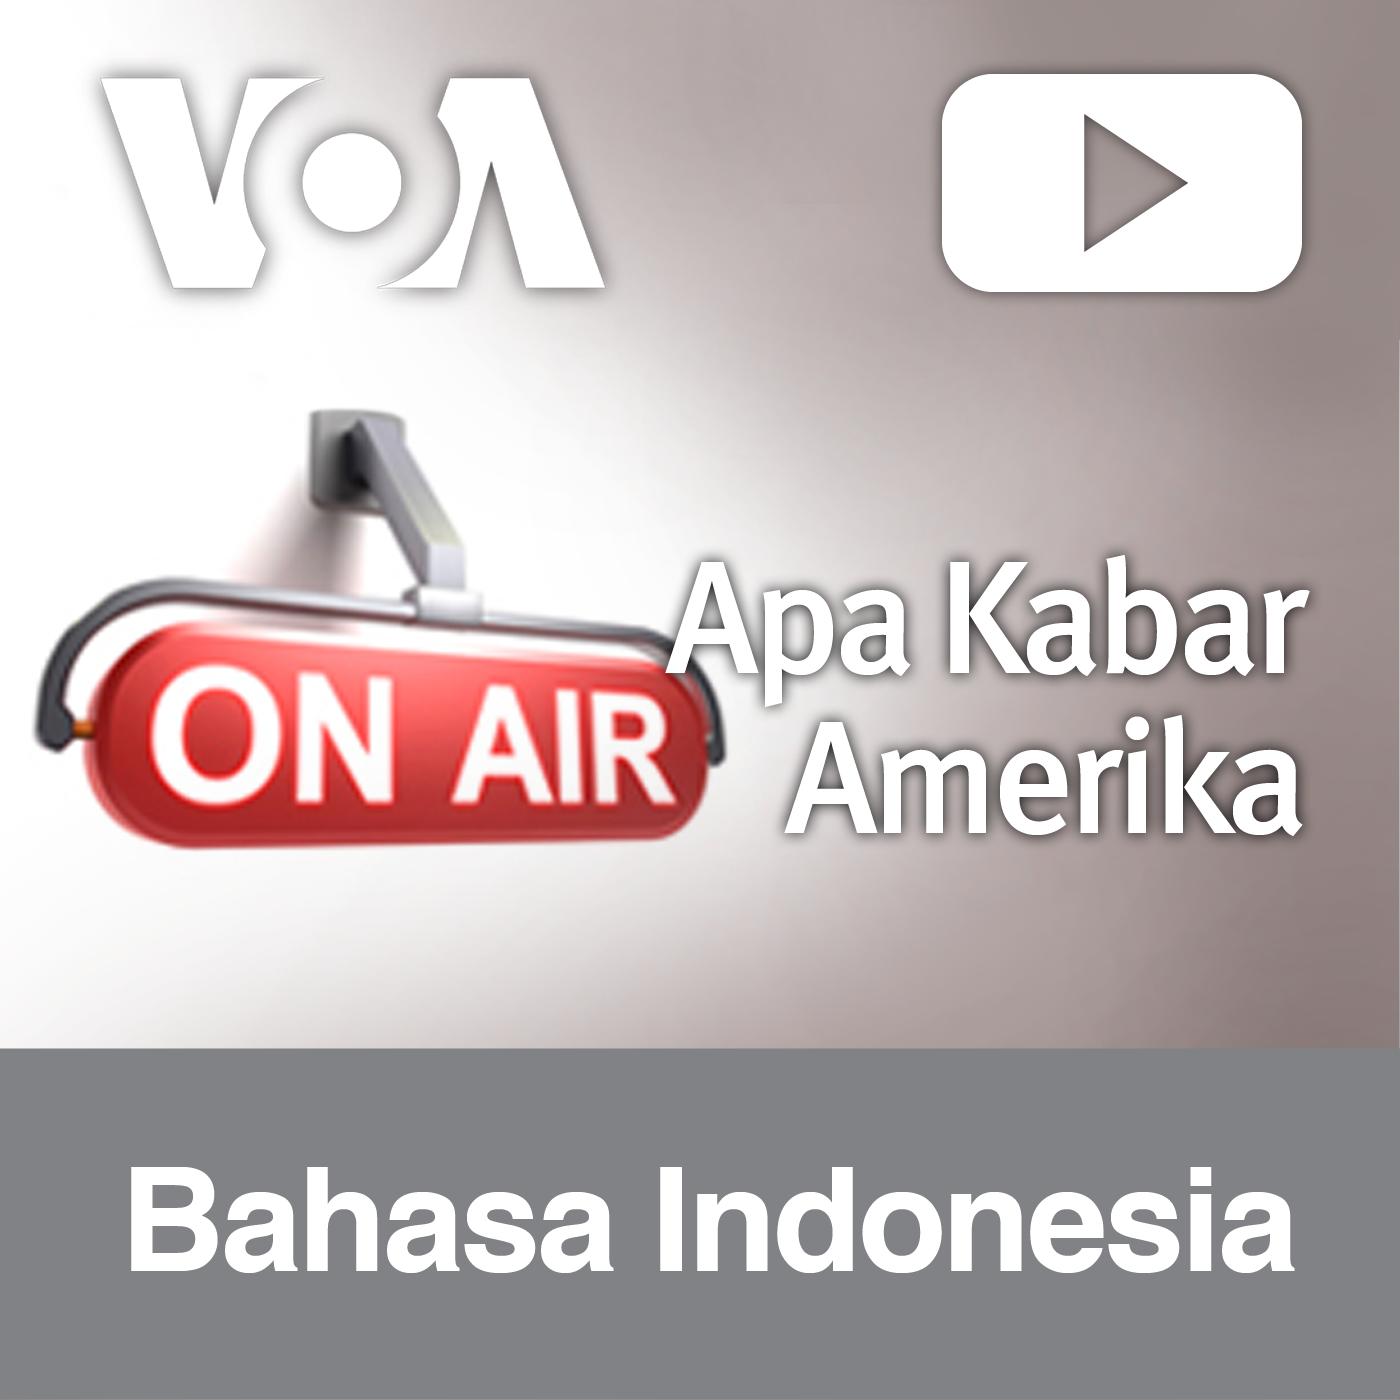 Apa Kabar Amerika - Voice of America | Bahasa Indonesia